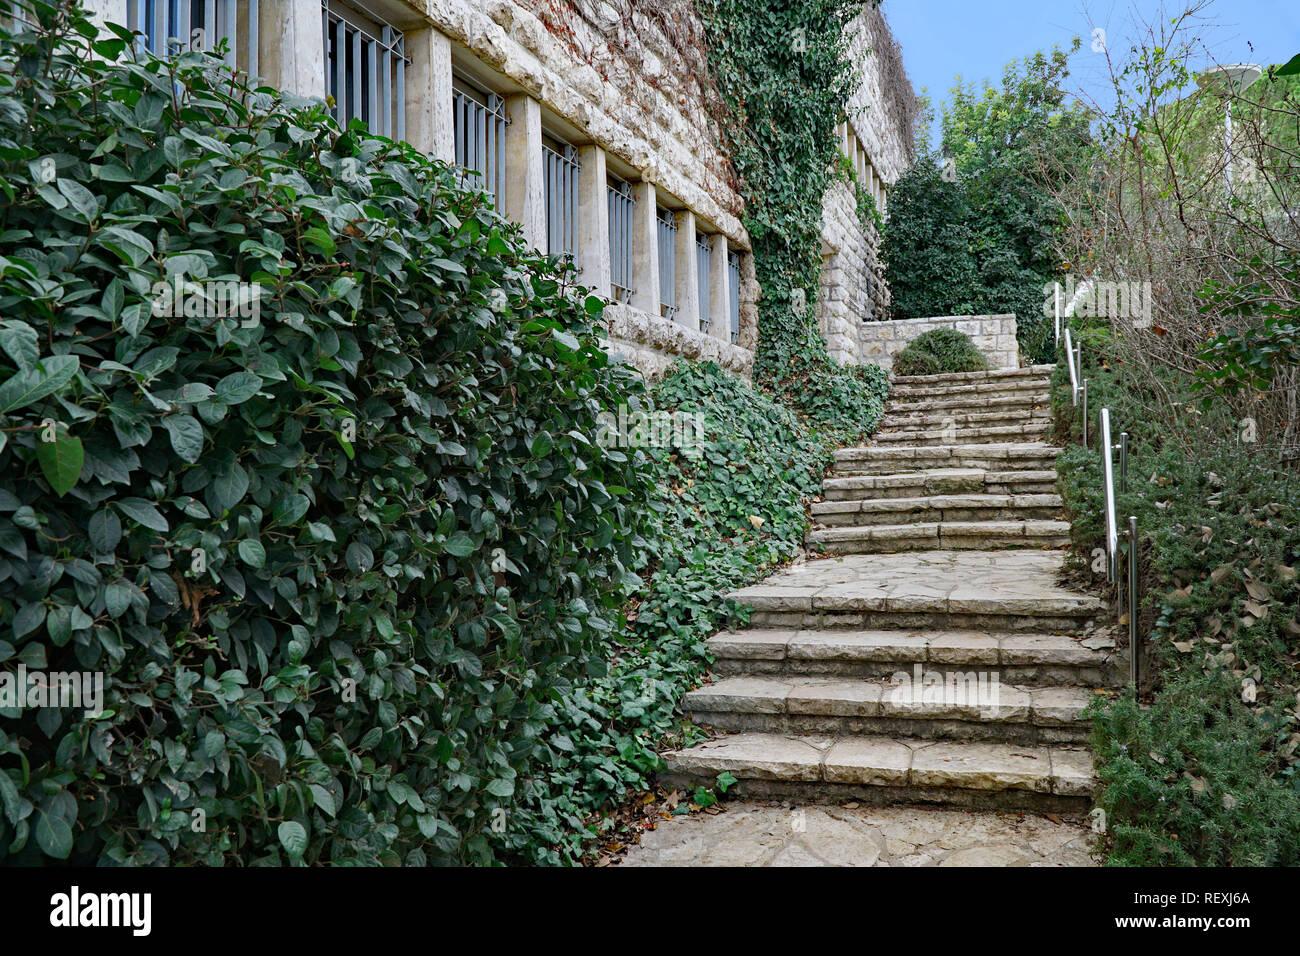 steps leading up to the entrance of an old stone university building, Hebrew University, Jerusalem, Givat Ram - Stock Image